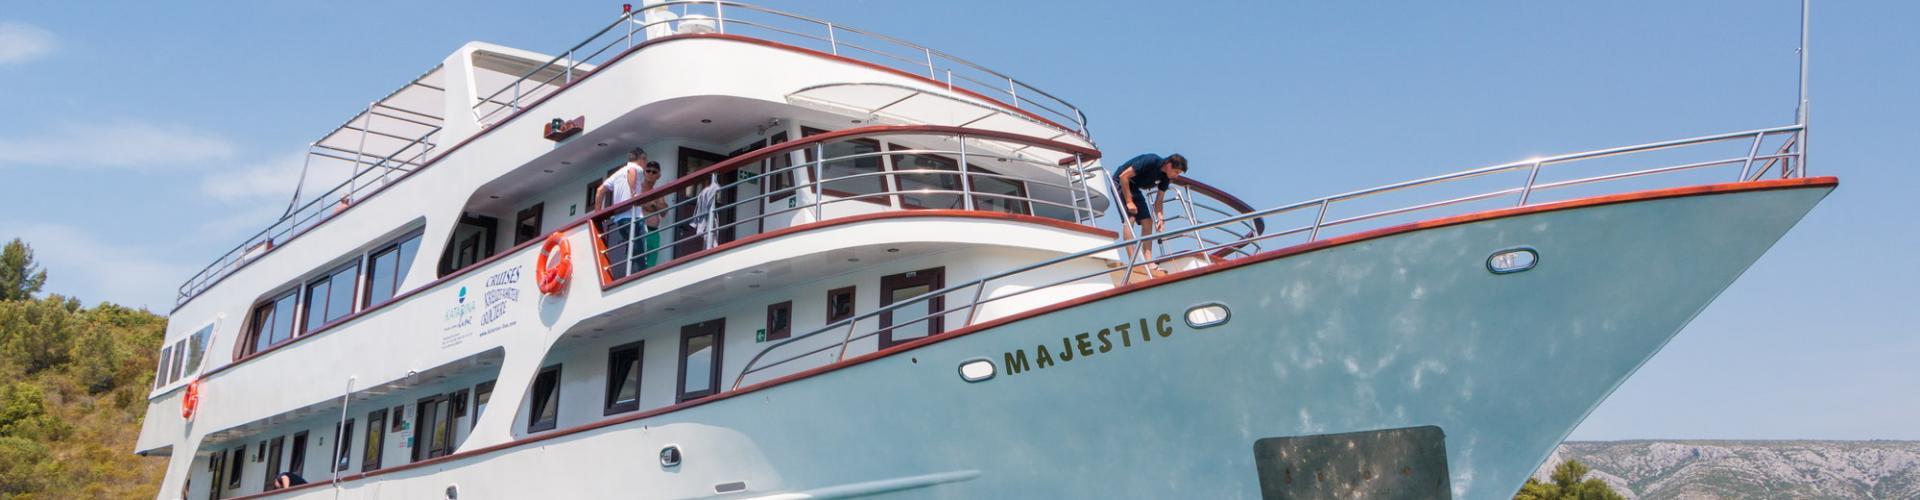 Premium Superior cruiser MV Majestic- motor yacht